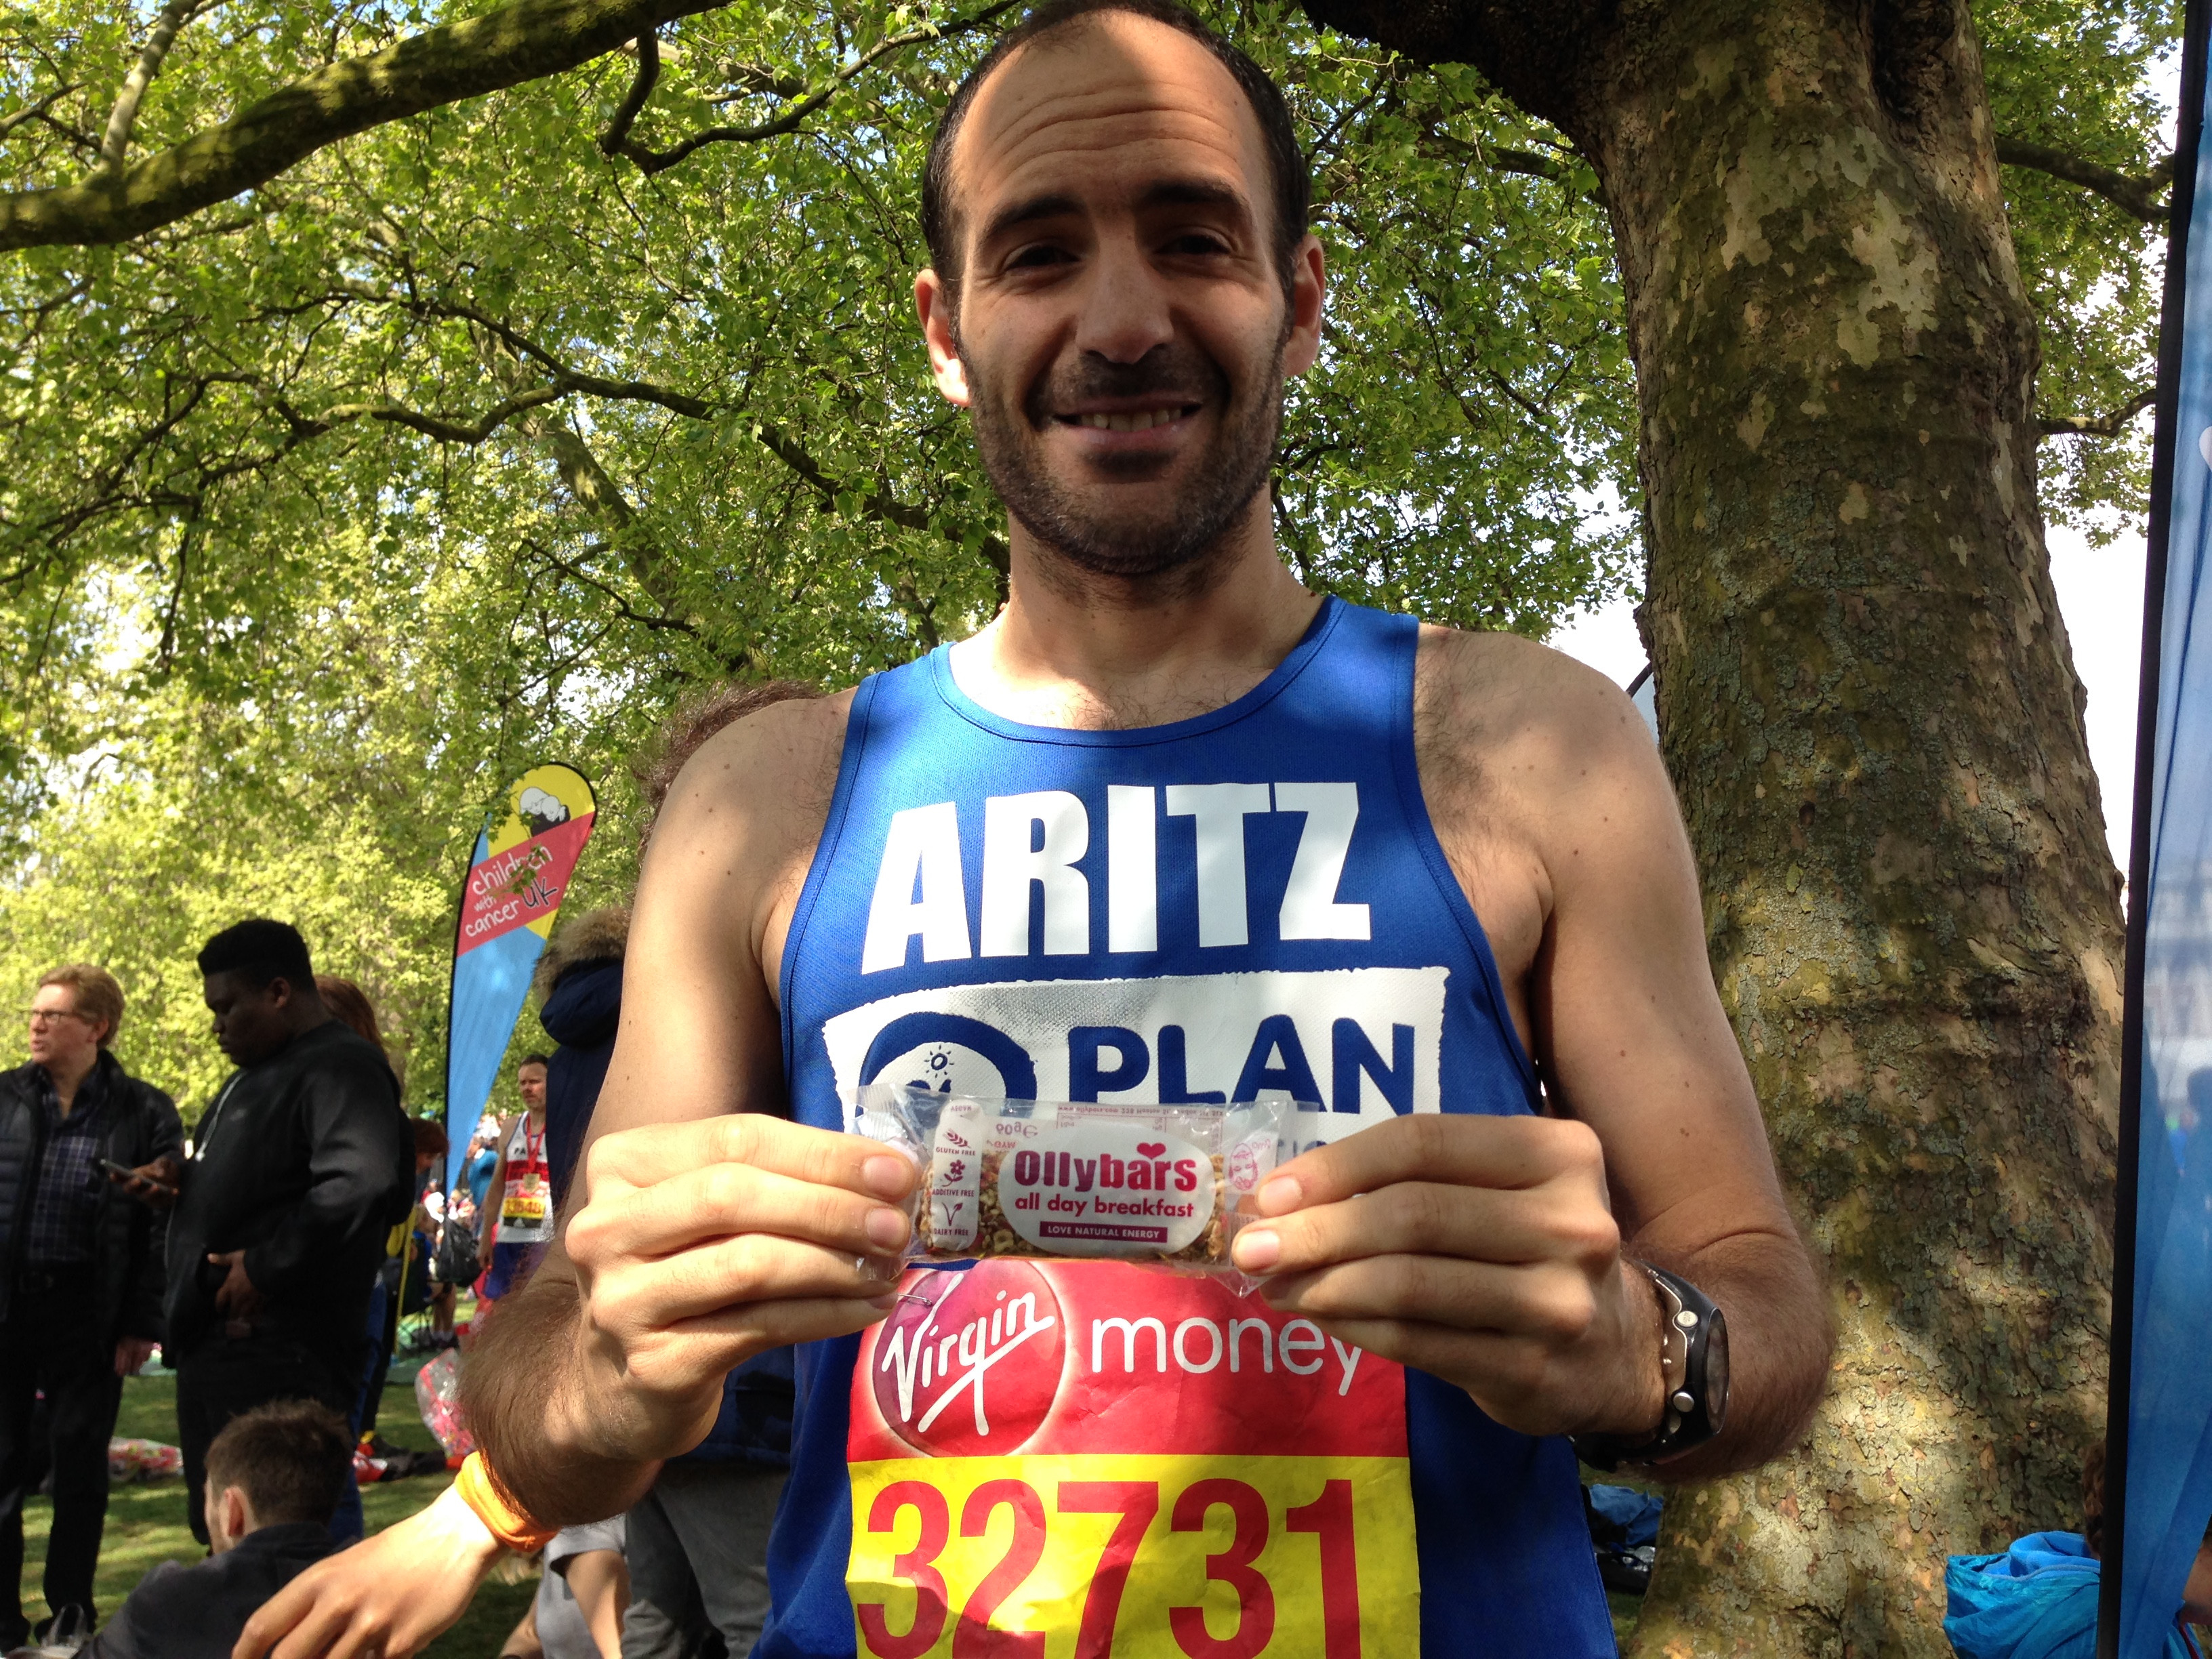 Plan runner Artiz celebrates at the finish of the London Marathon